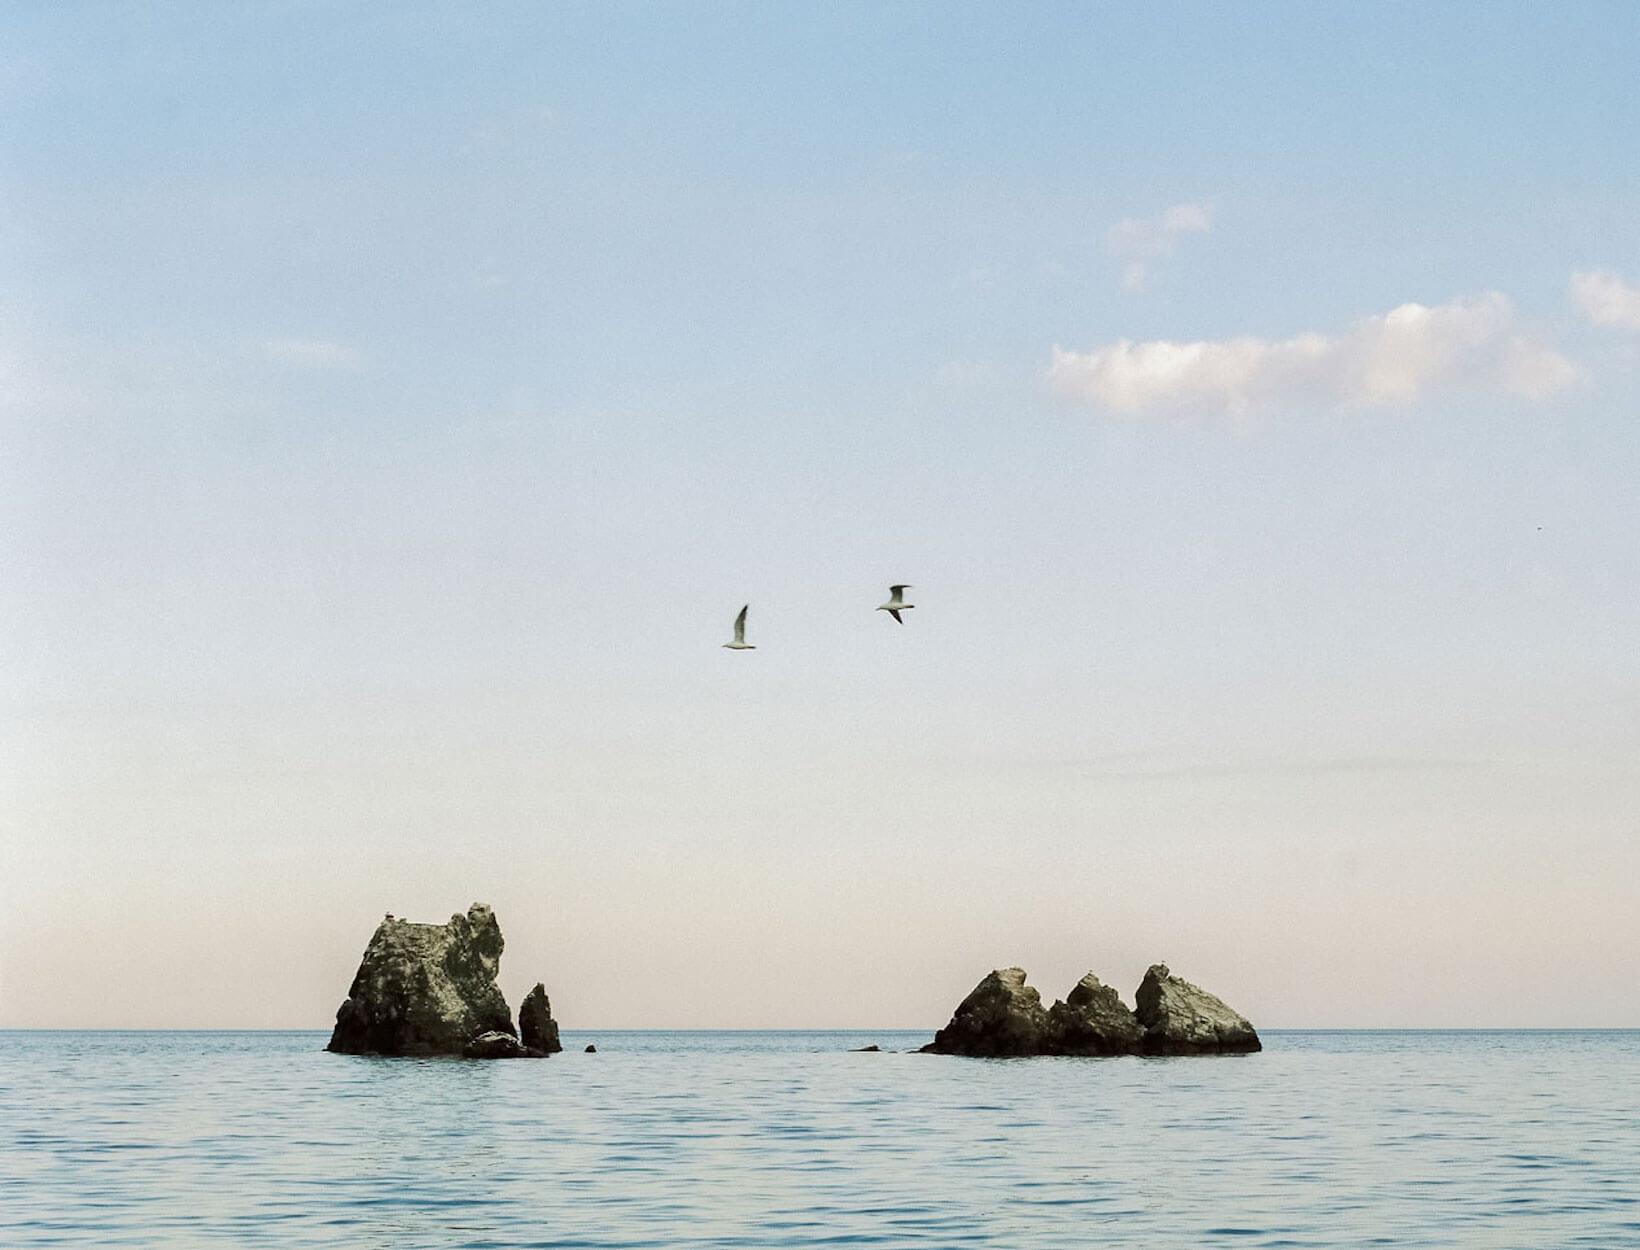 birds flying over an ocean